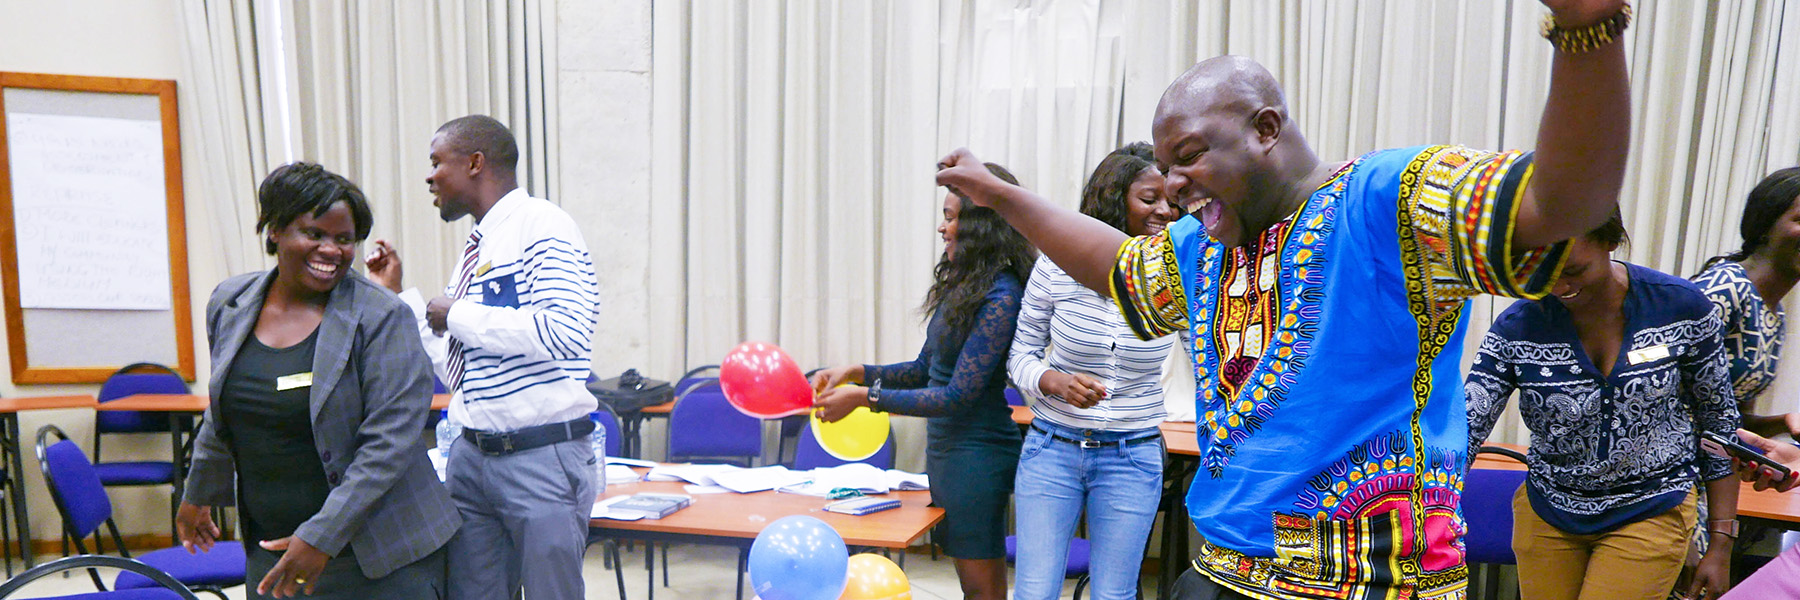 Participants Celebrating In Oshana, Namibia